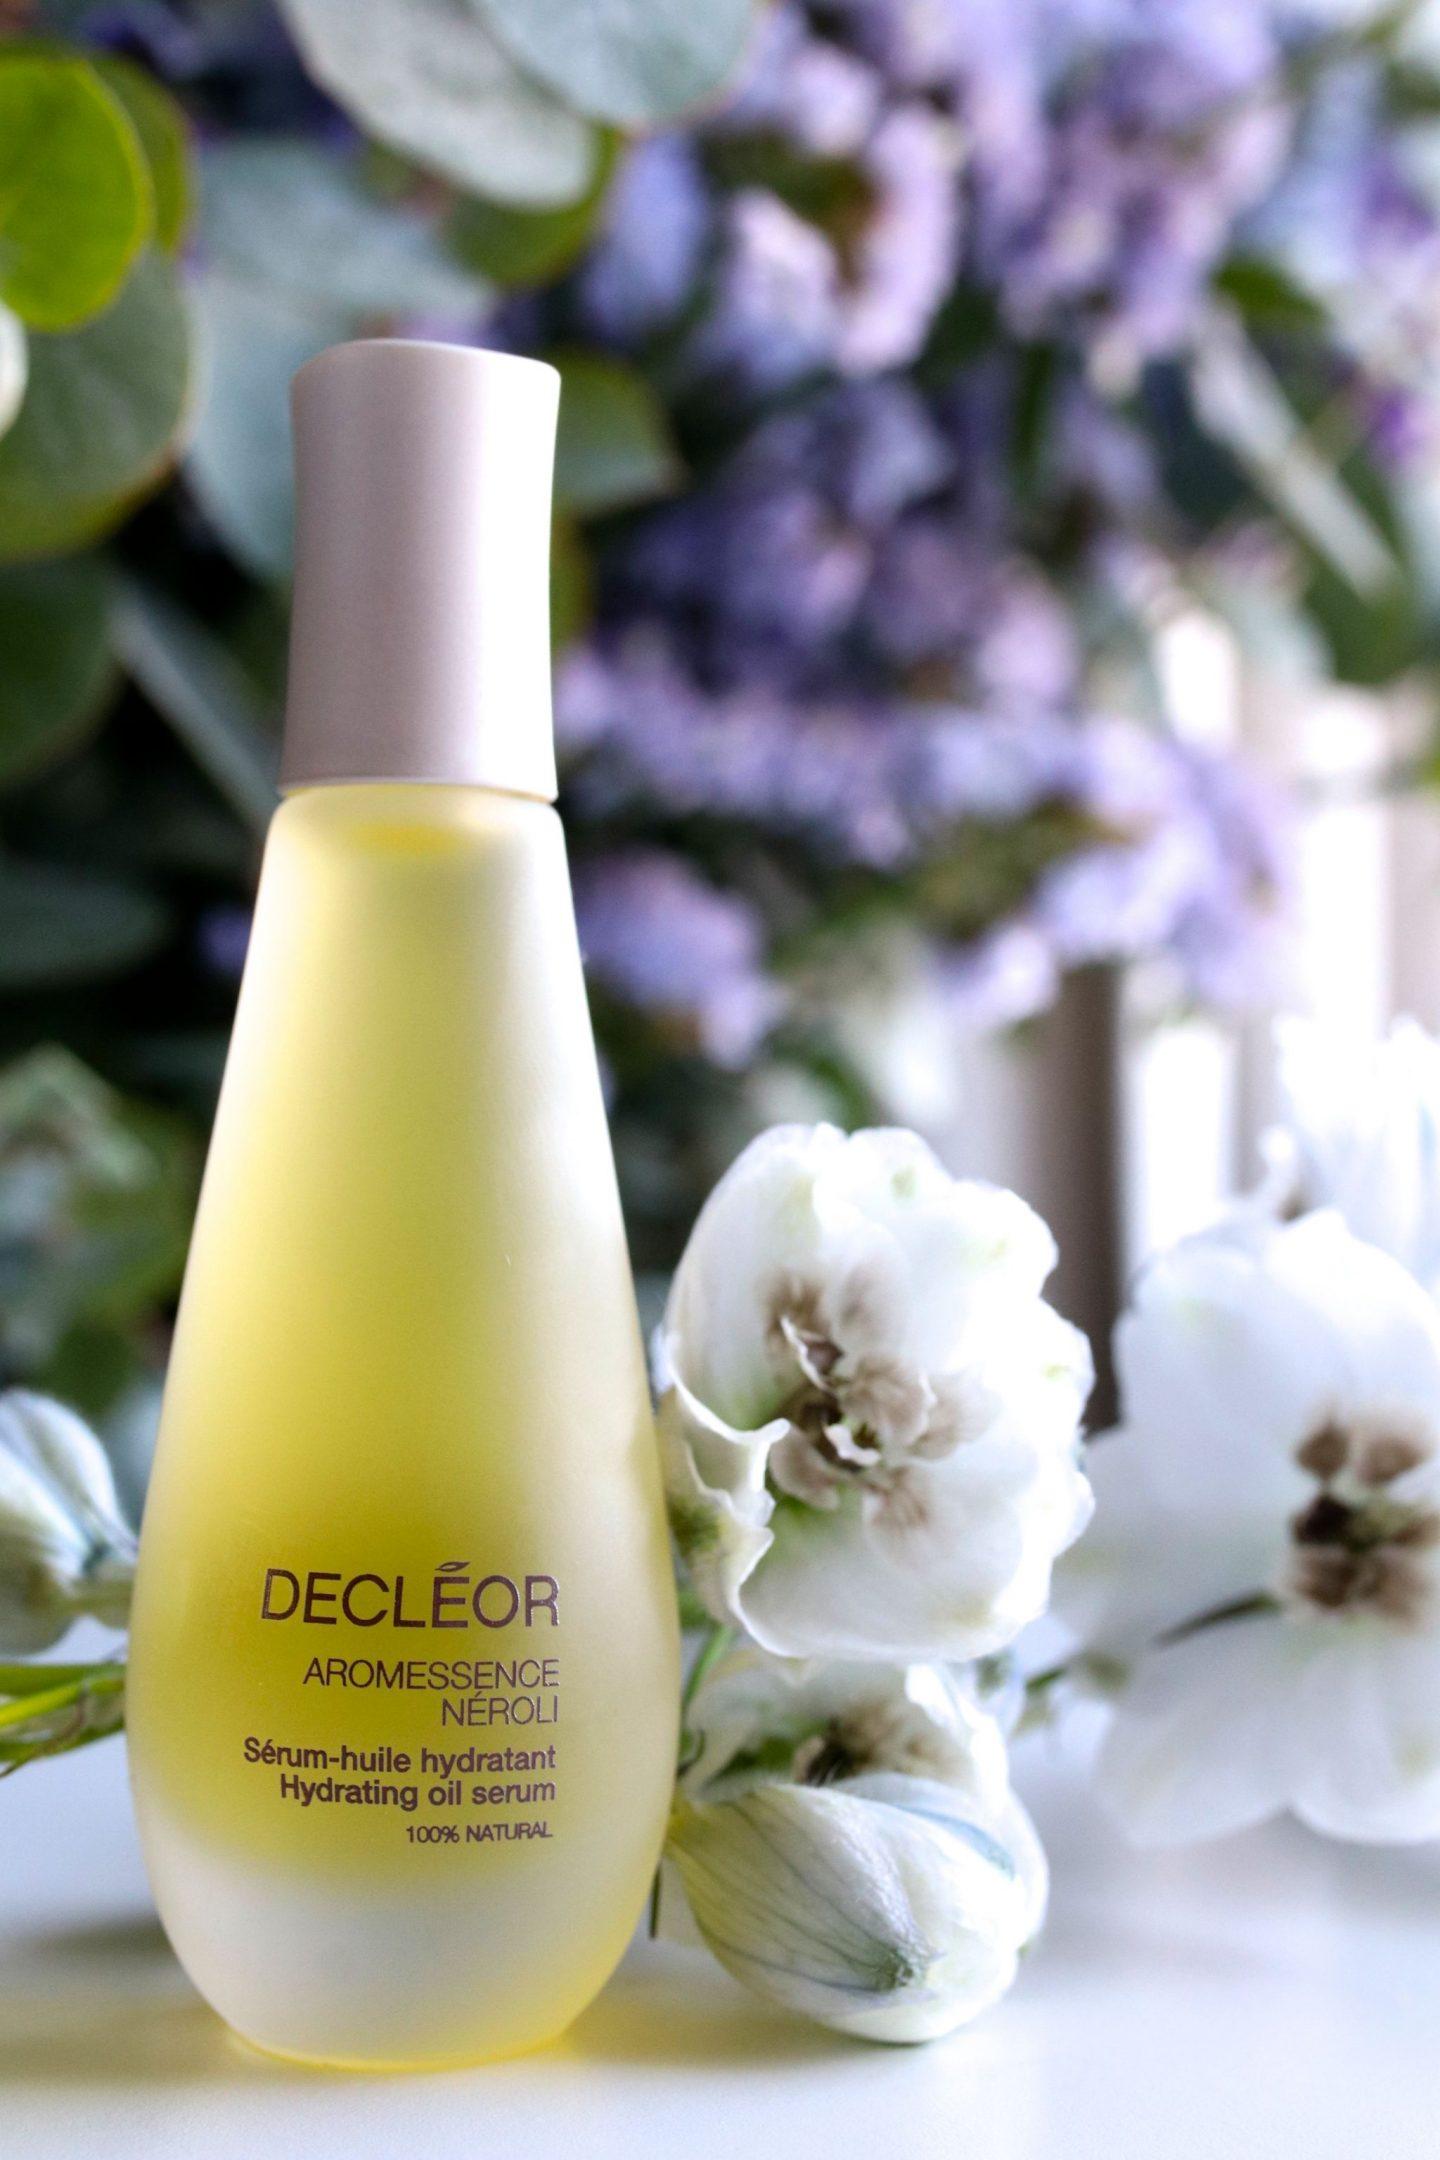 Decleor Aromessence Neroli, Hydrating Oil Serum